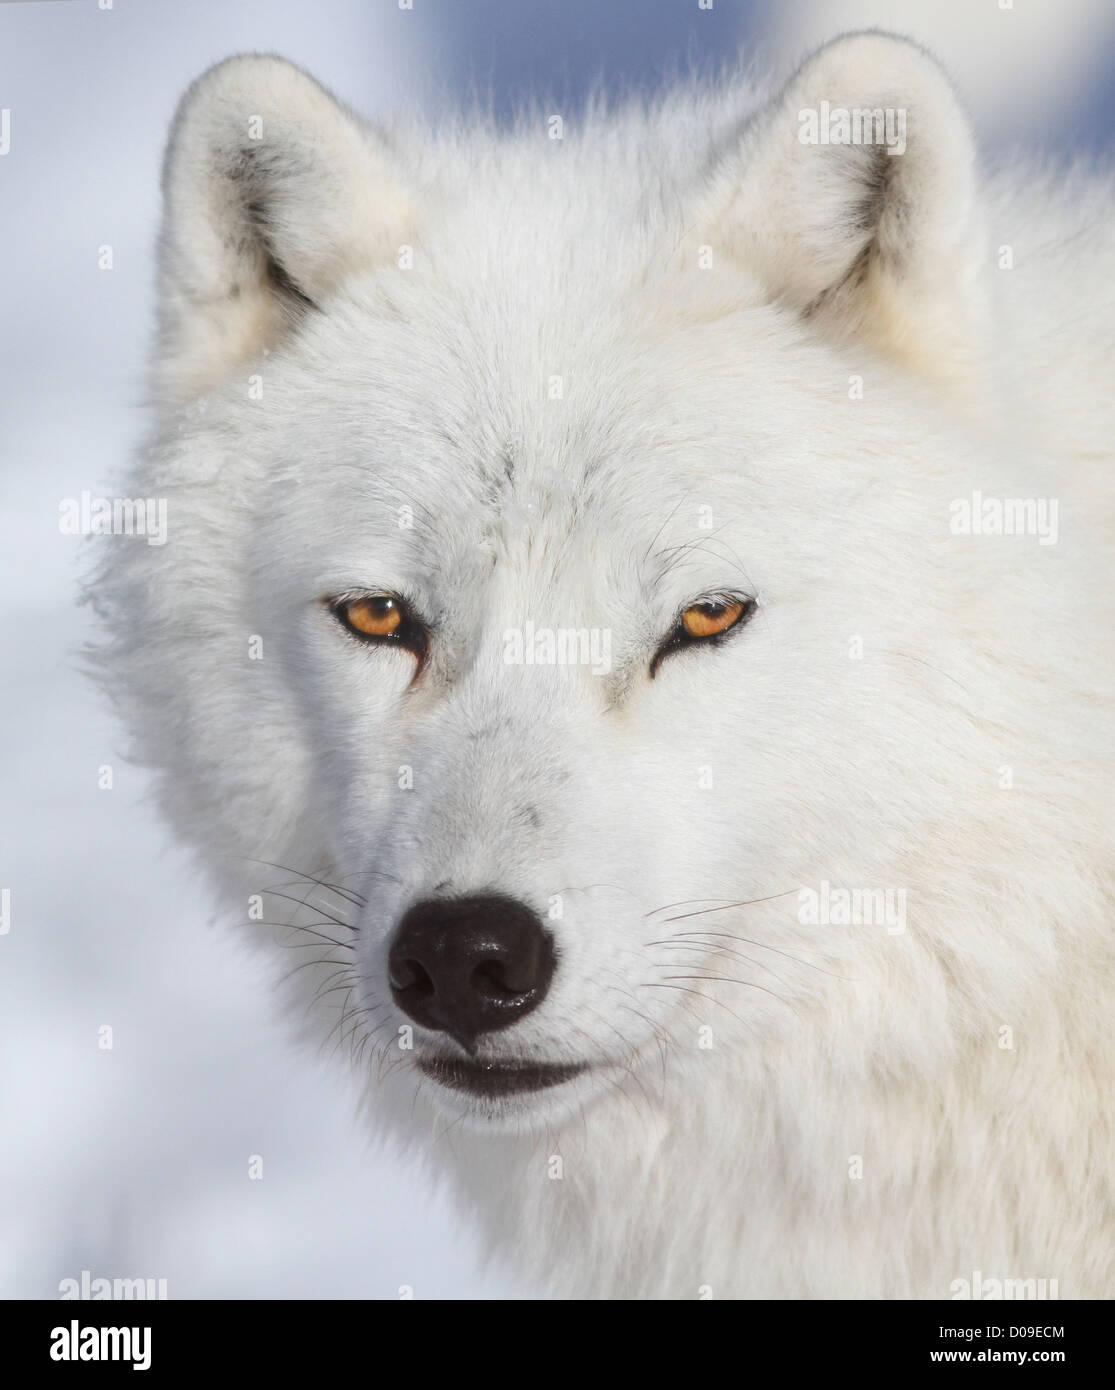 White Alpha male Arctic wolf portrait in winter. - Stock Image